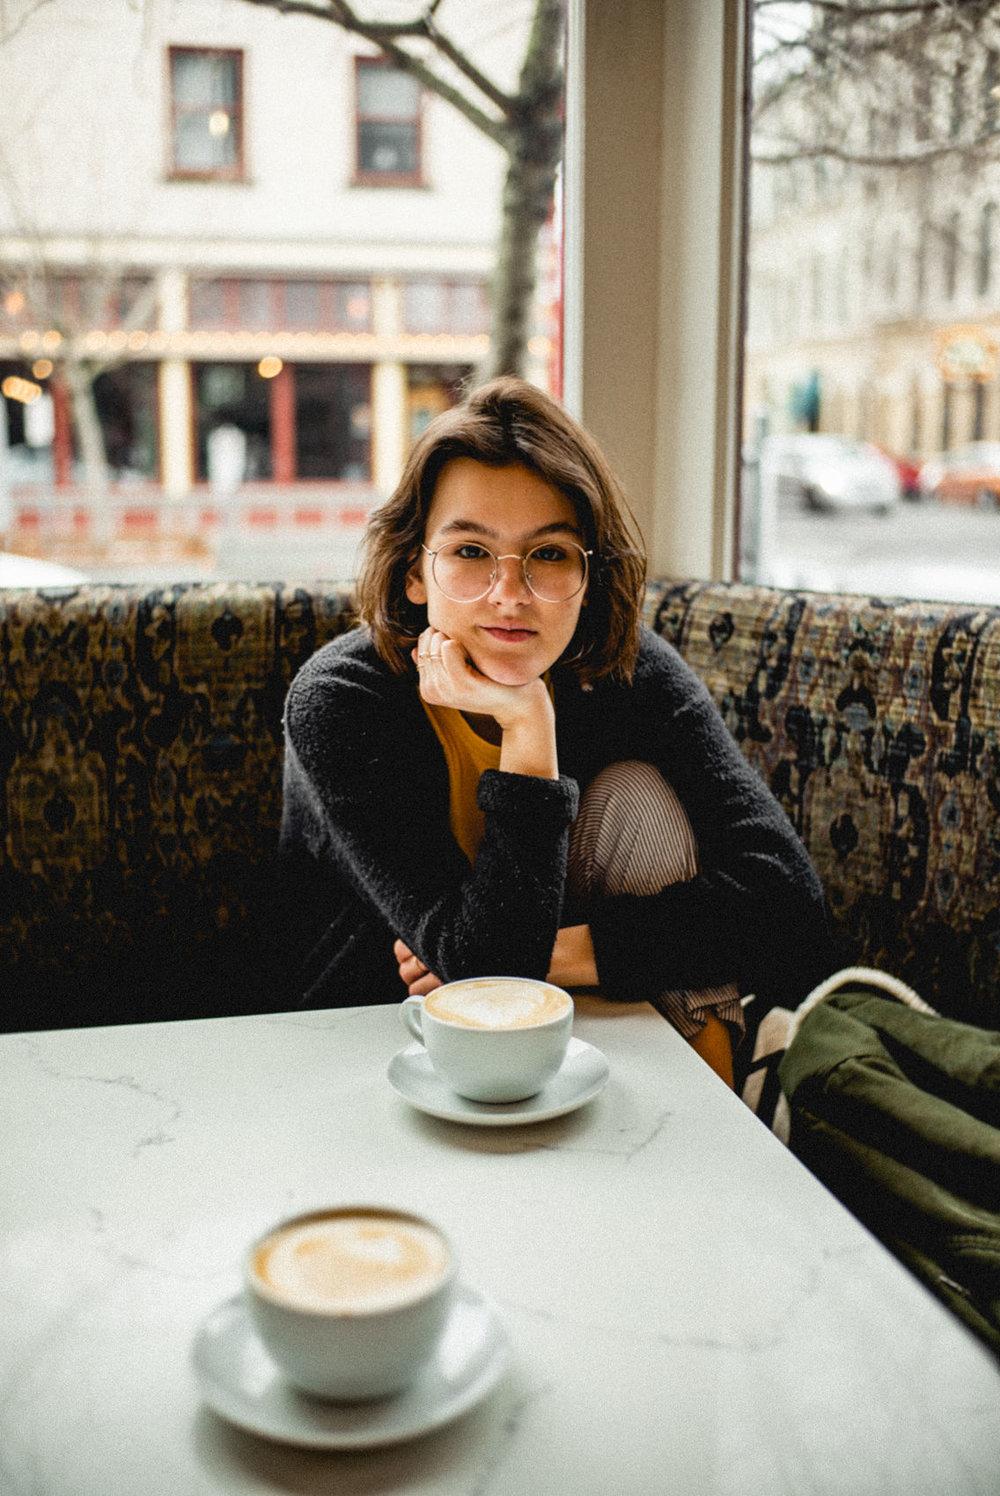 Leica portraits in a coffee shop in Portland